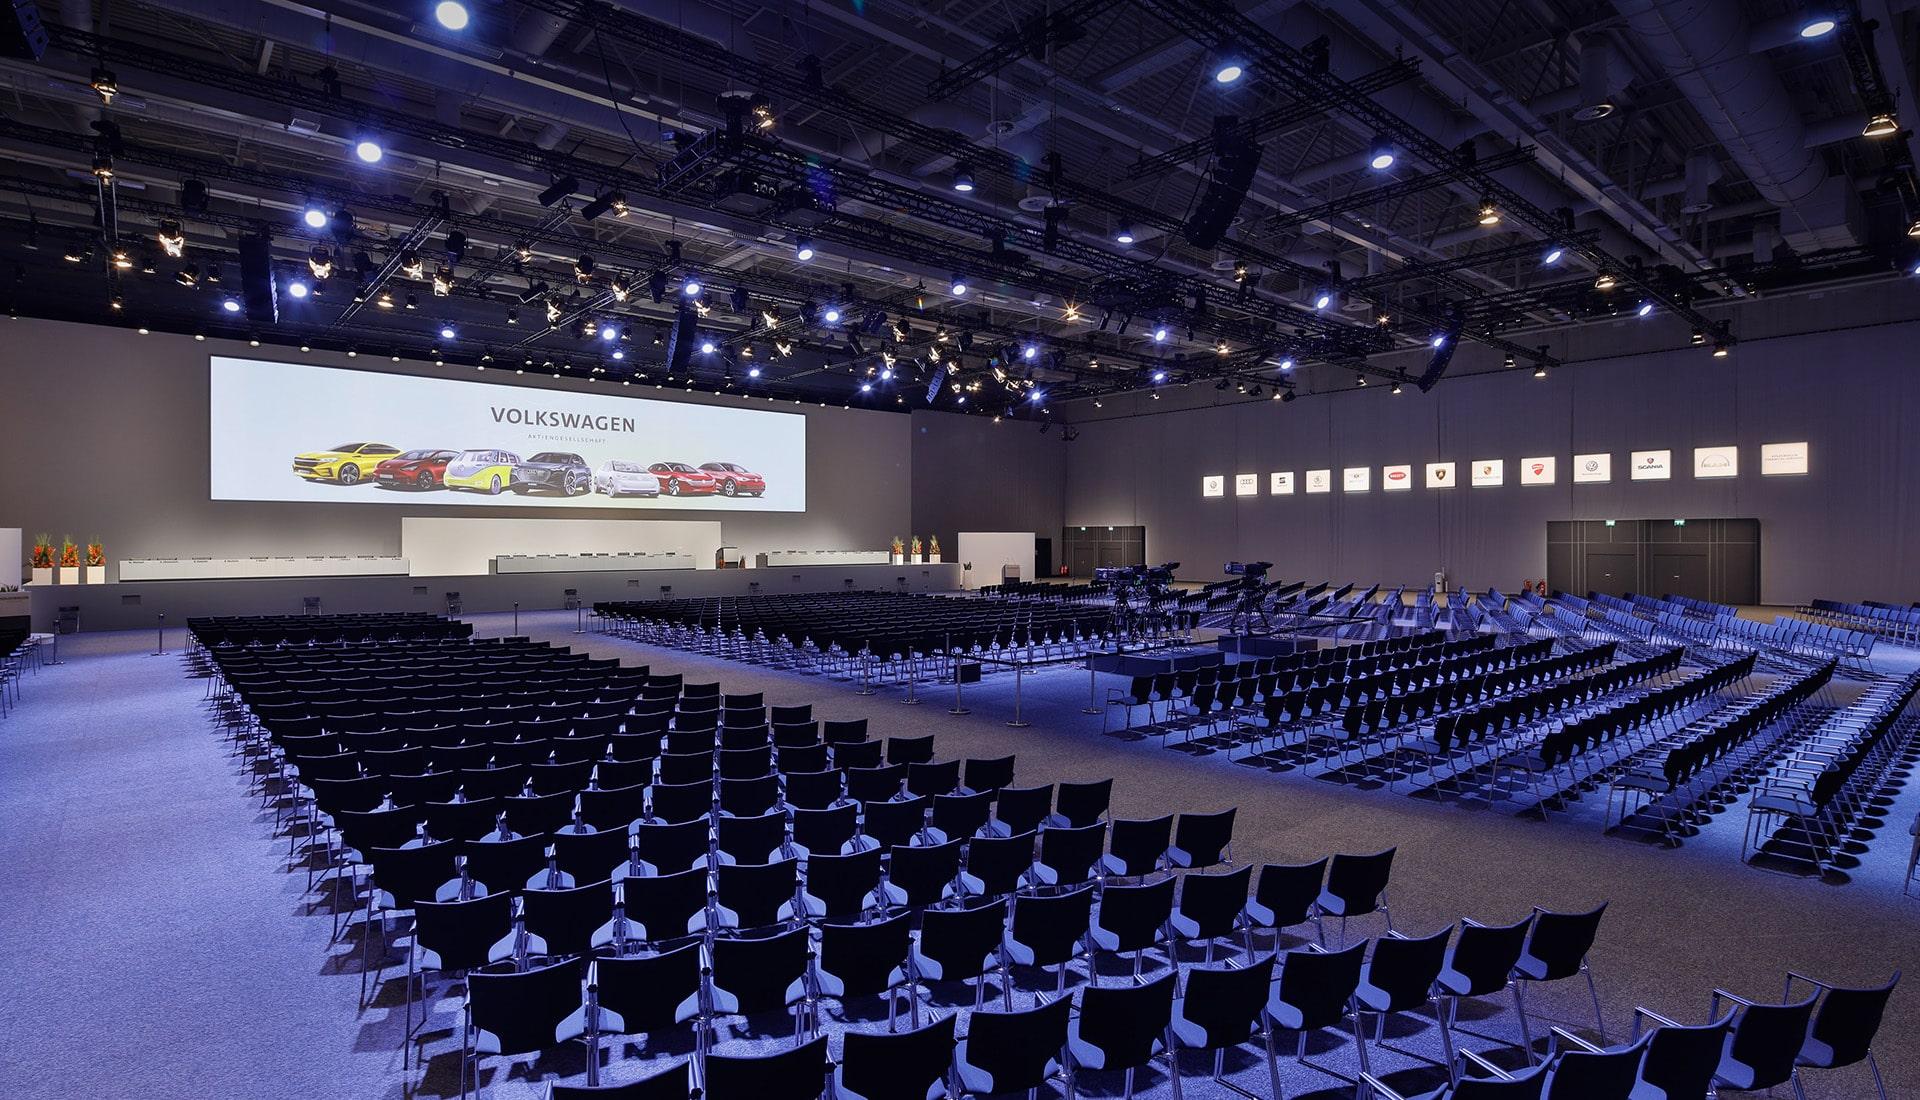 Eventplanung VW HV 2019   Eventbau   Maedebach Braunschweig  